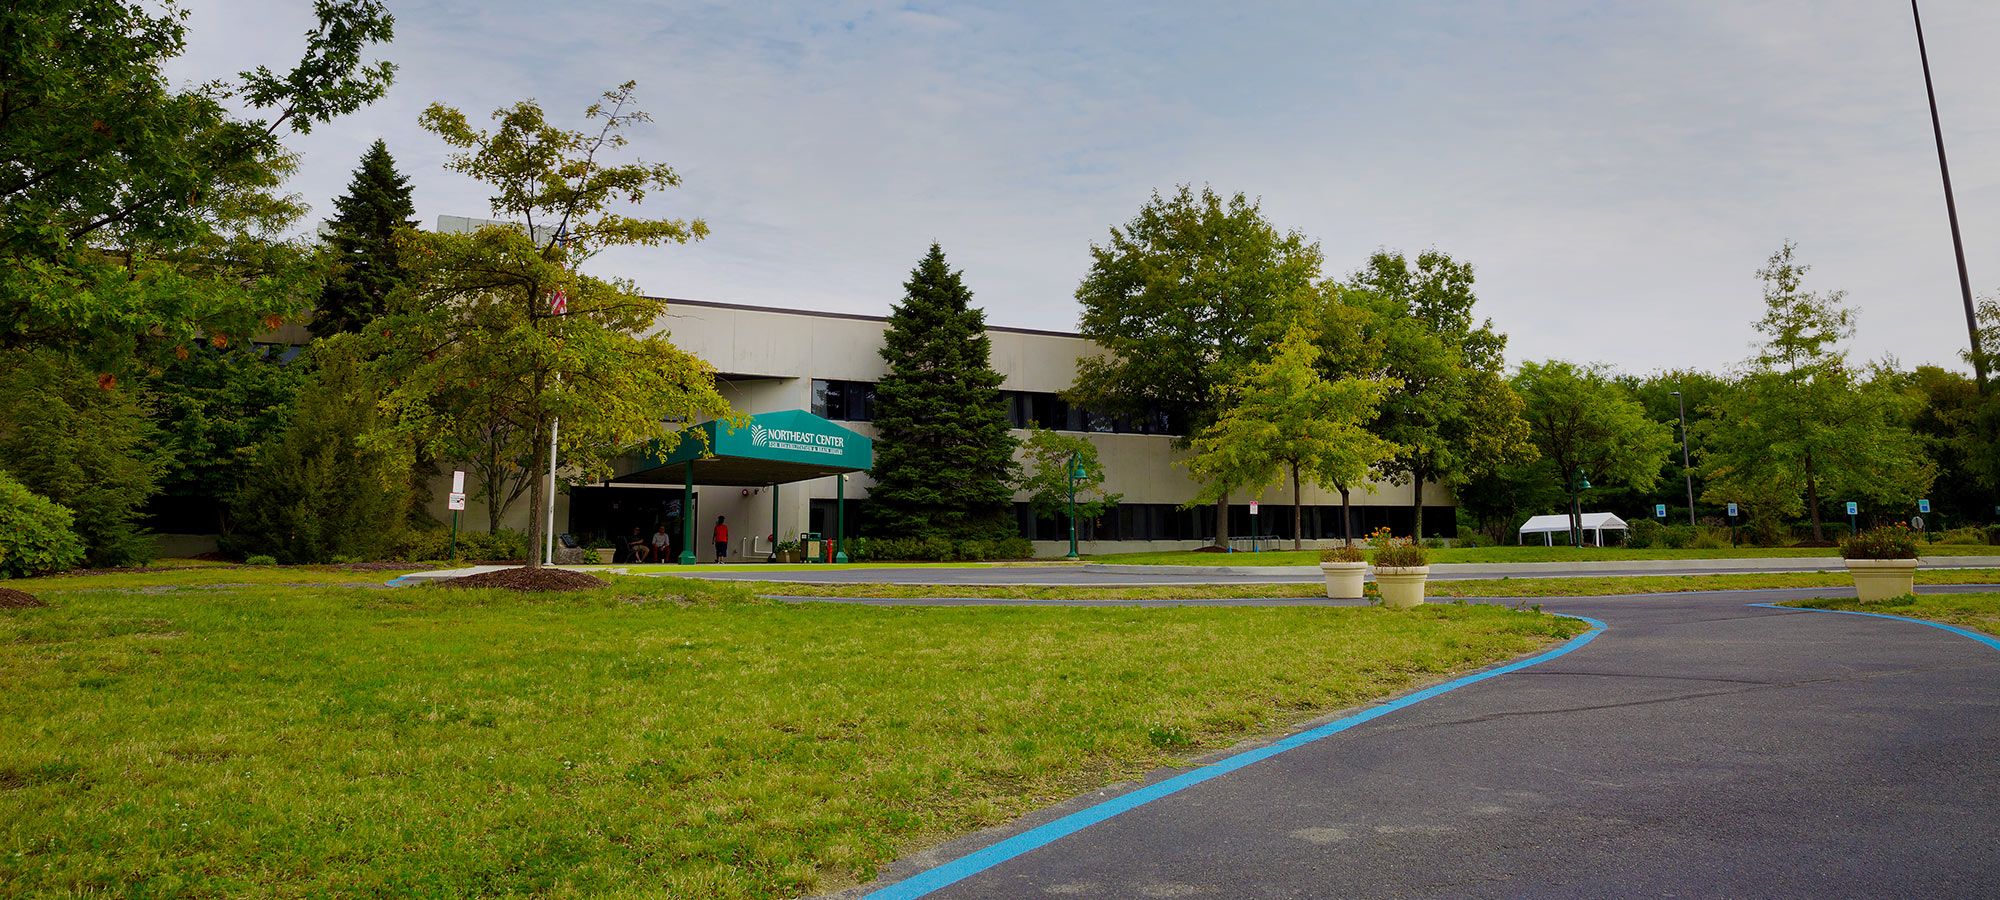 northeast center rehabilitation center